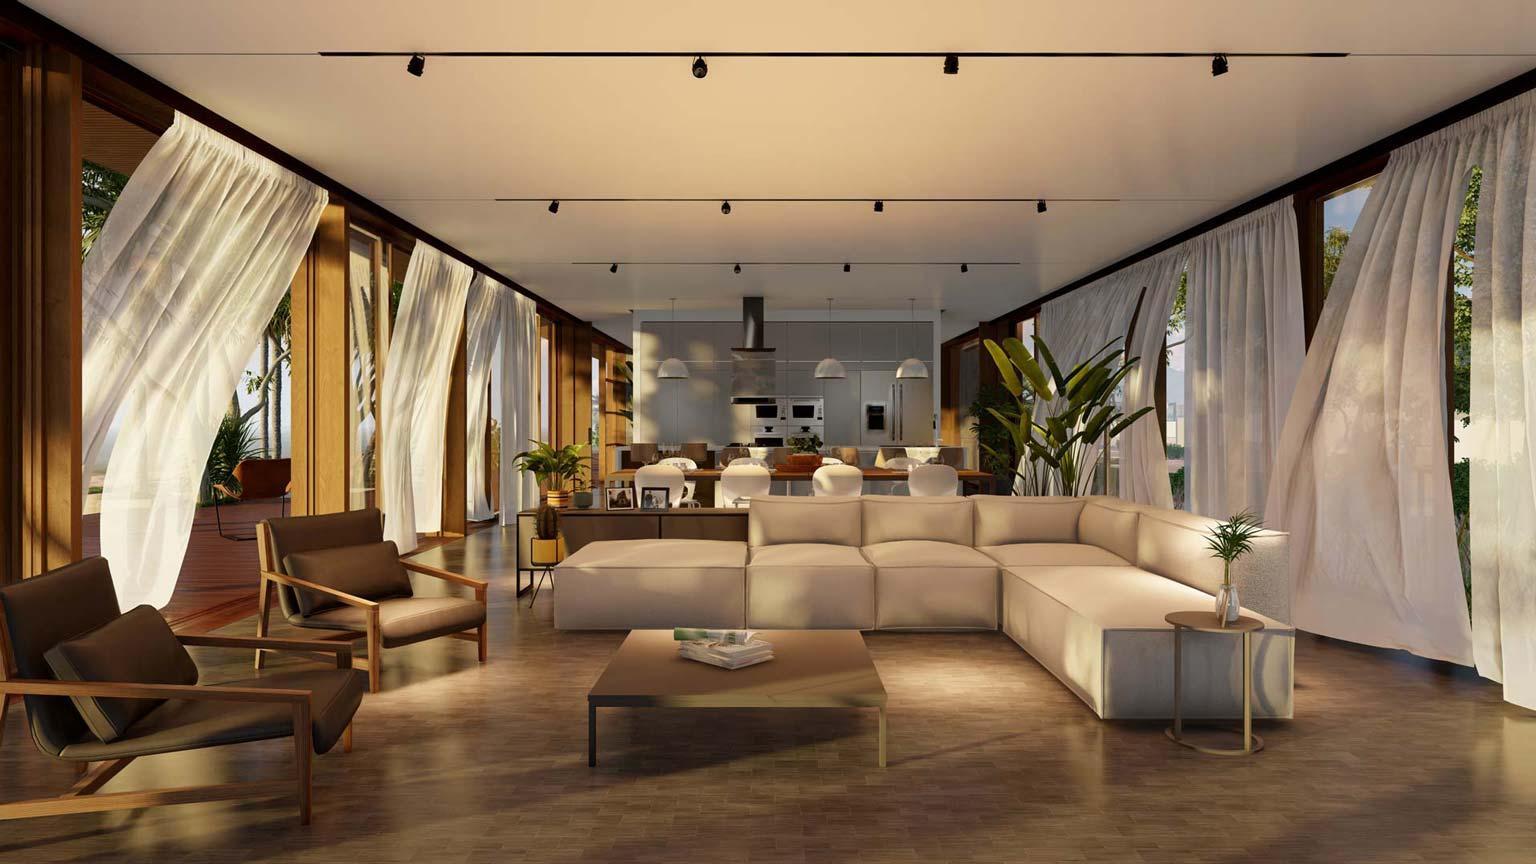 Beach-house-interior-1536x864_Lumion10_Pixel-HeadStudio